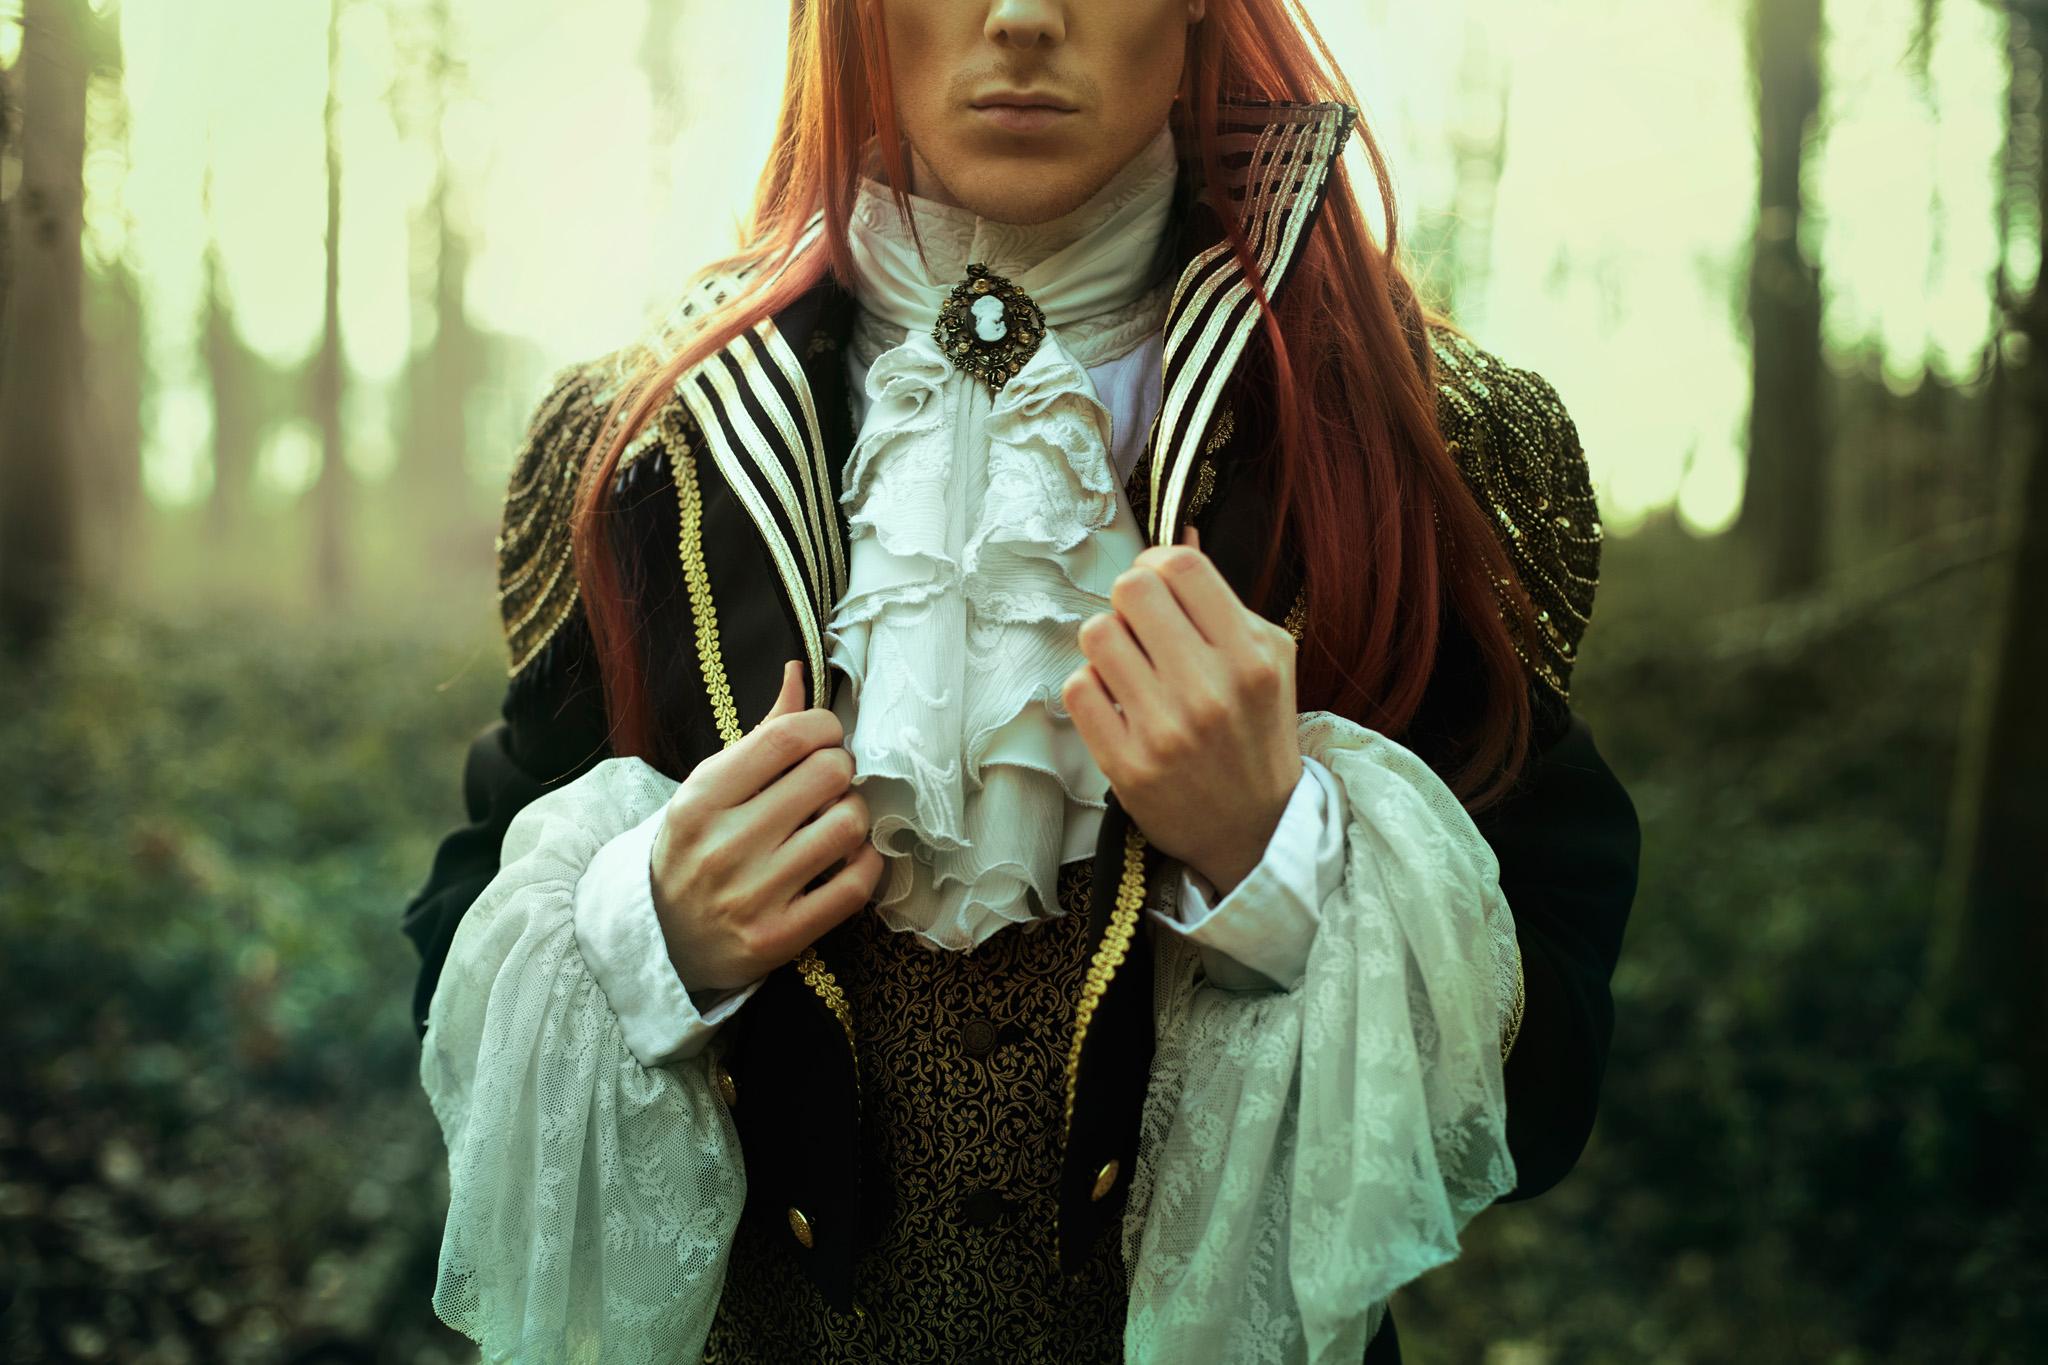 bella-kotak-fairytale-fairytales-labyrinth-david-bowie-sarah-beauty-beast-magic-magical-faerie-magazine-editorial-firefly-path-twilight-woods-lantern-ethereal-fairy-disney-ian-hencher-5s.jpg